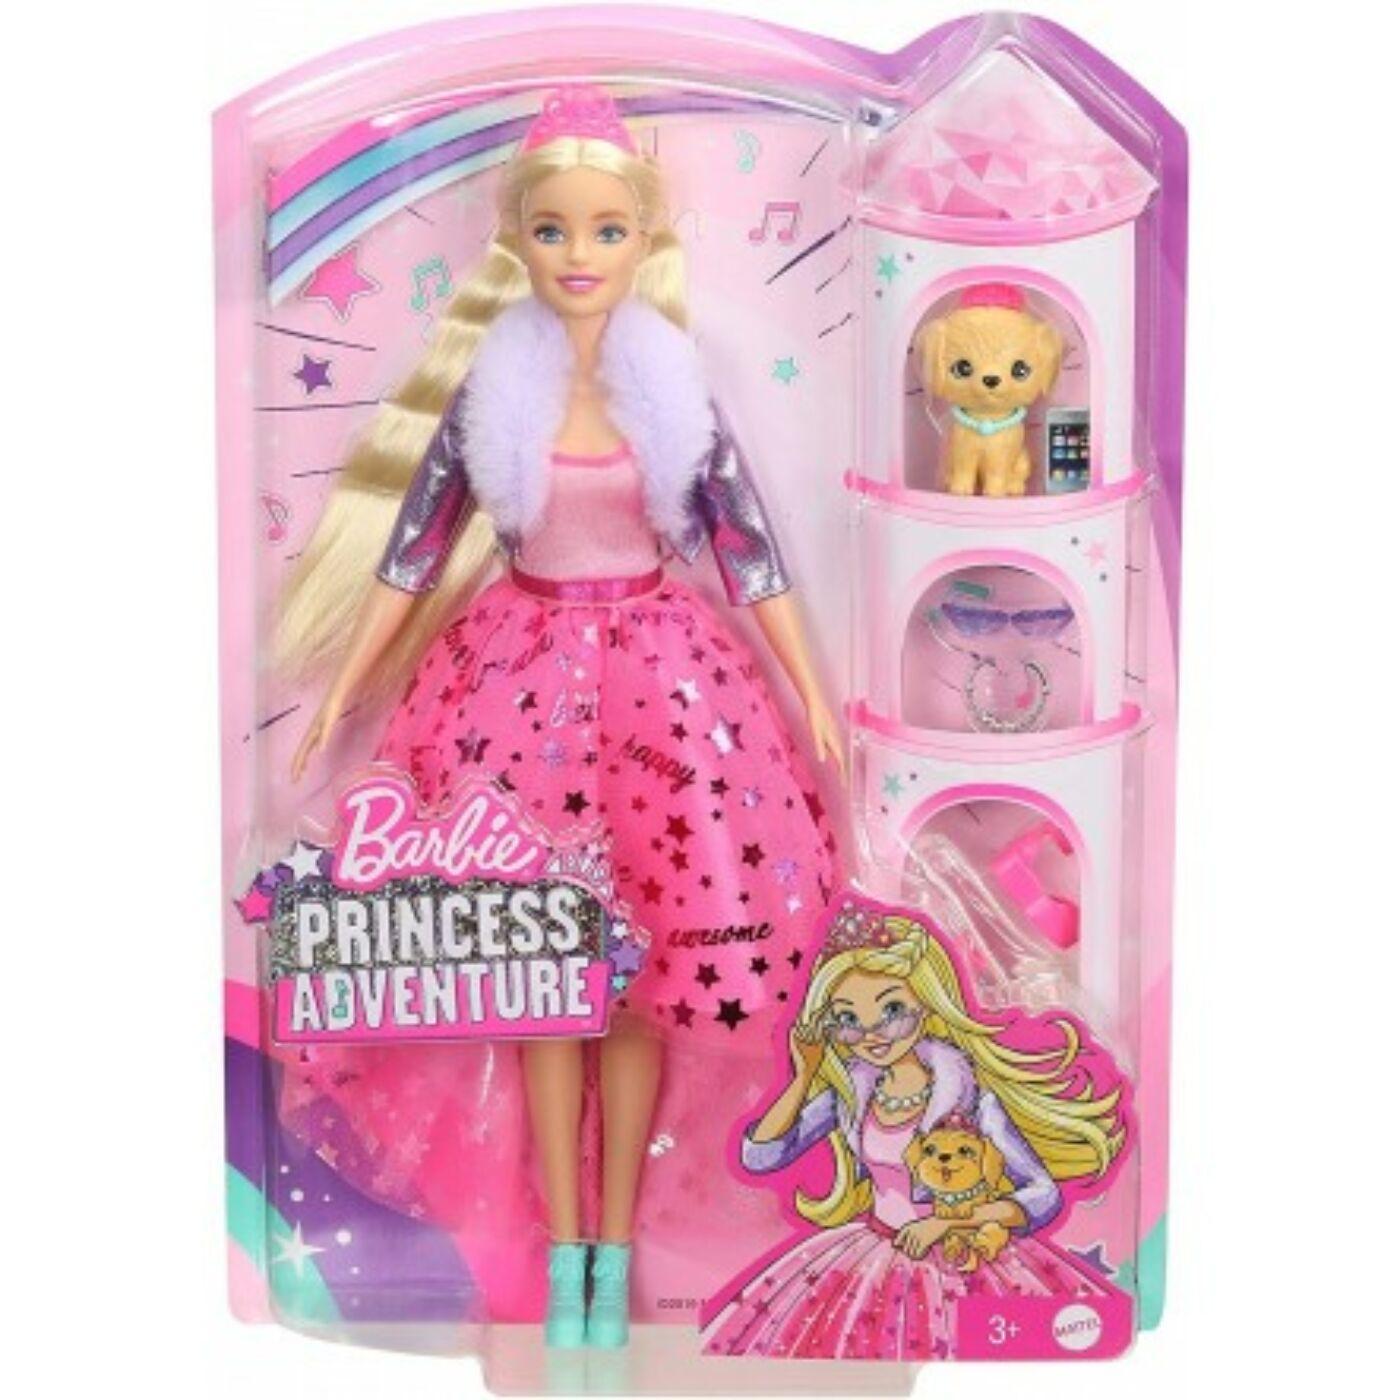 Barbie Princess Adventure - Deluxe hercegnők